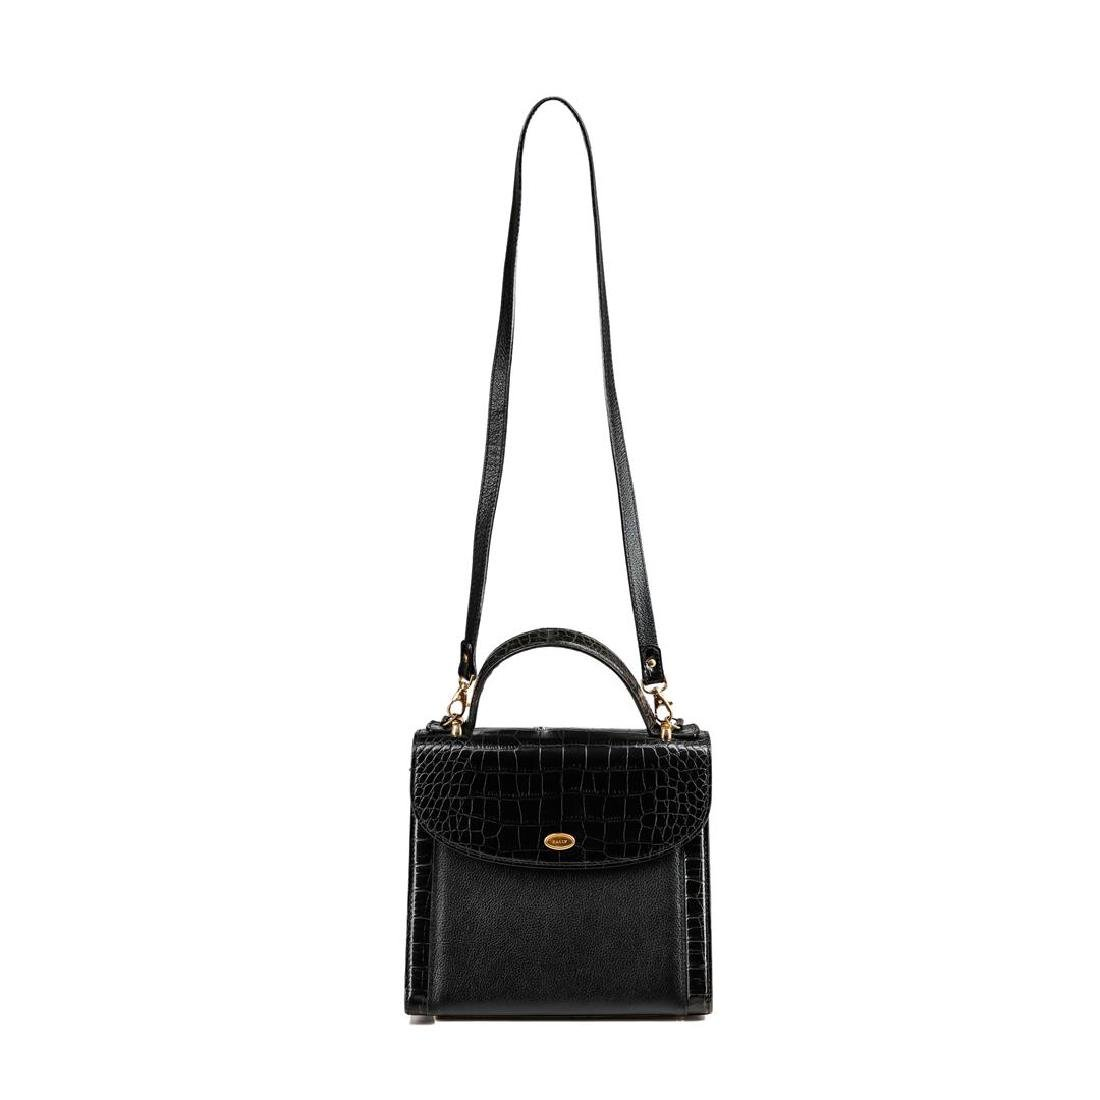 Bally Black Leather Handbag - 2